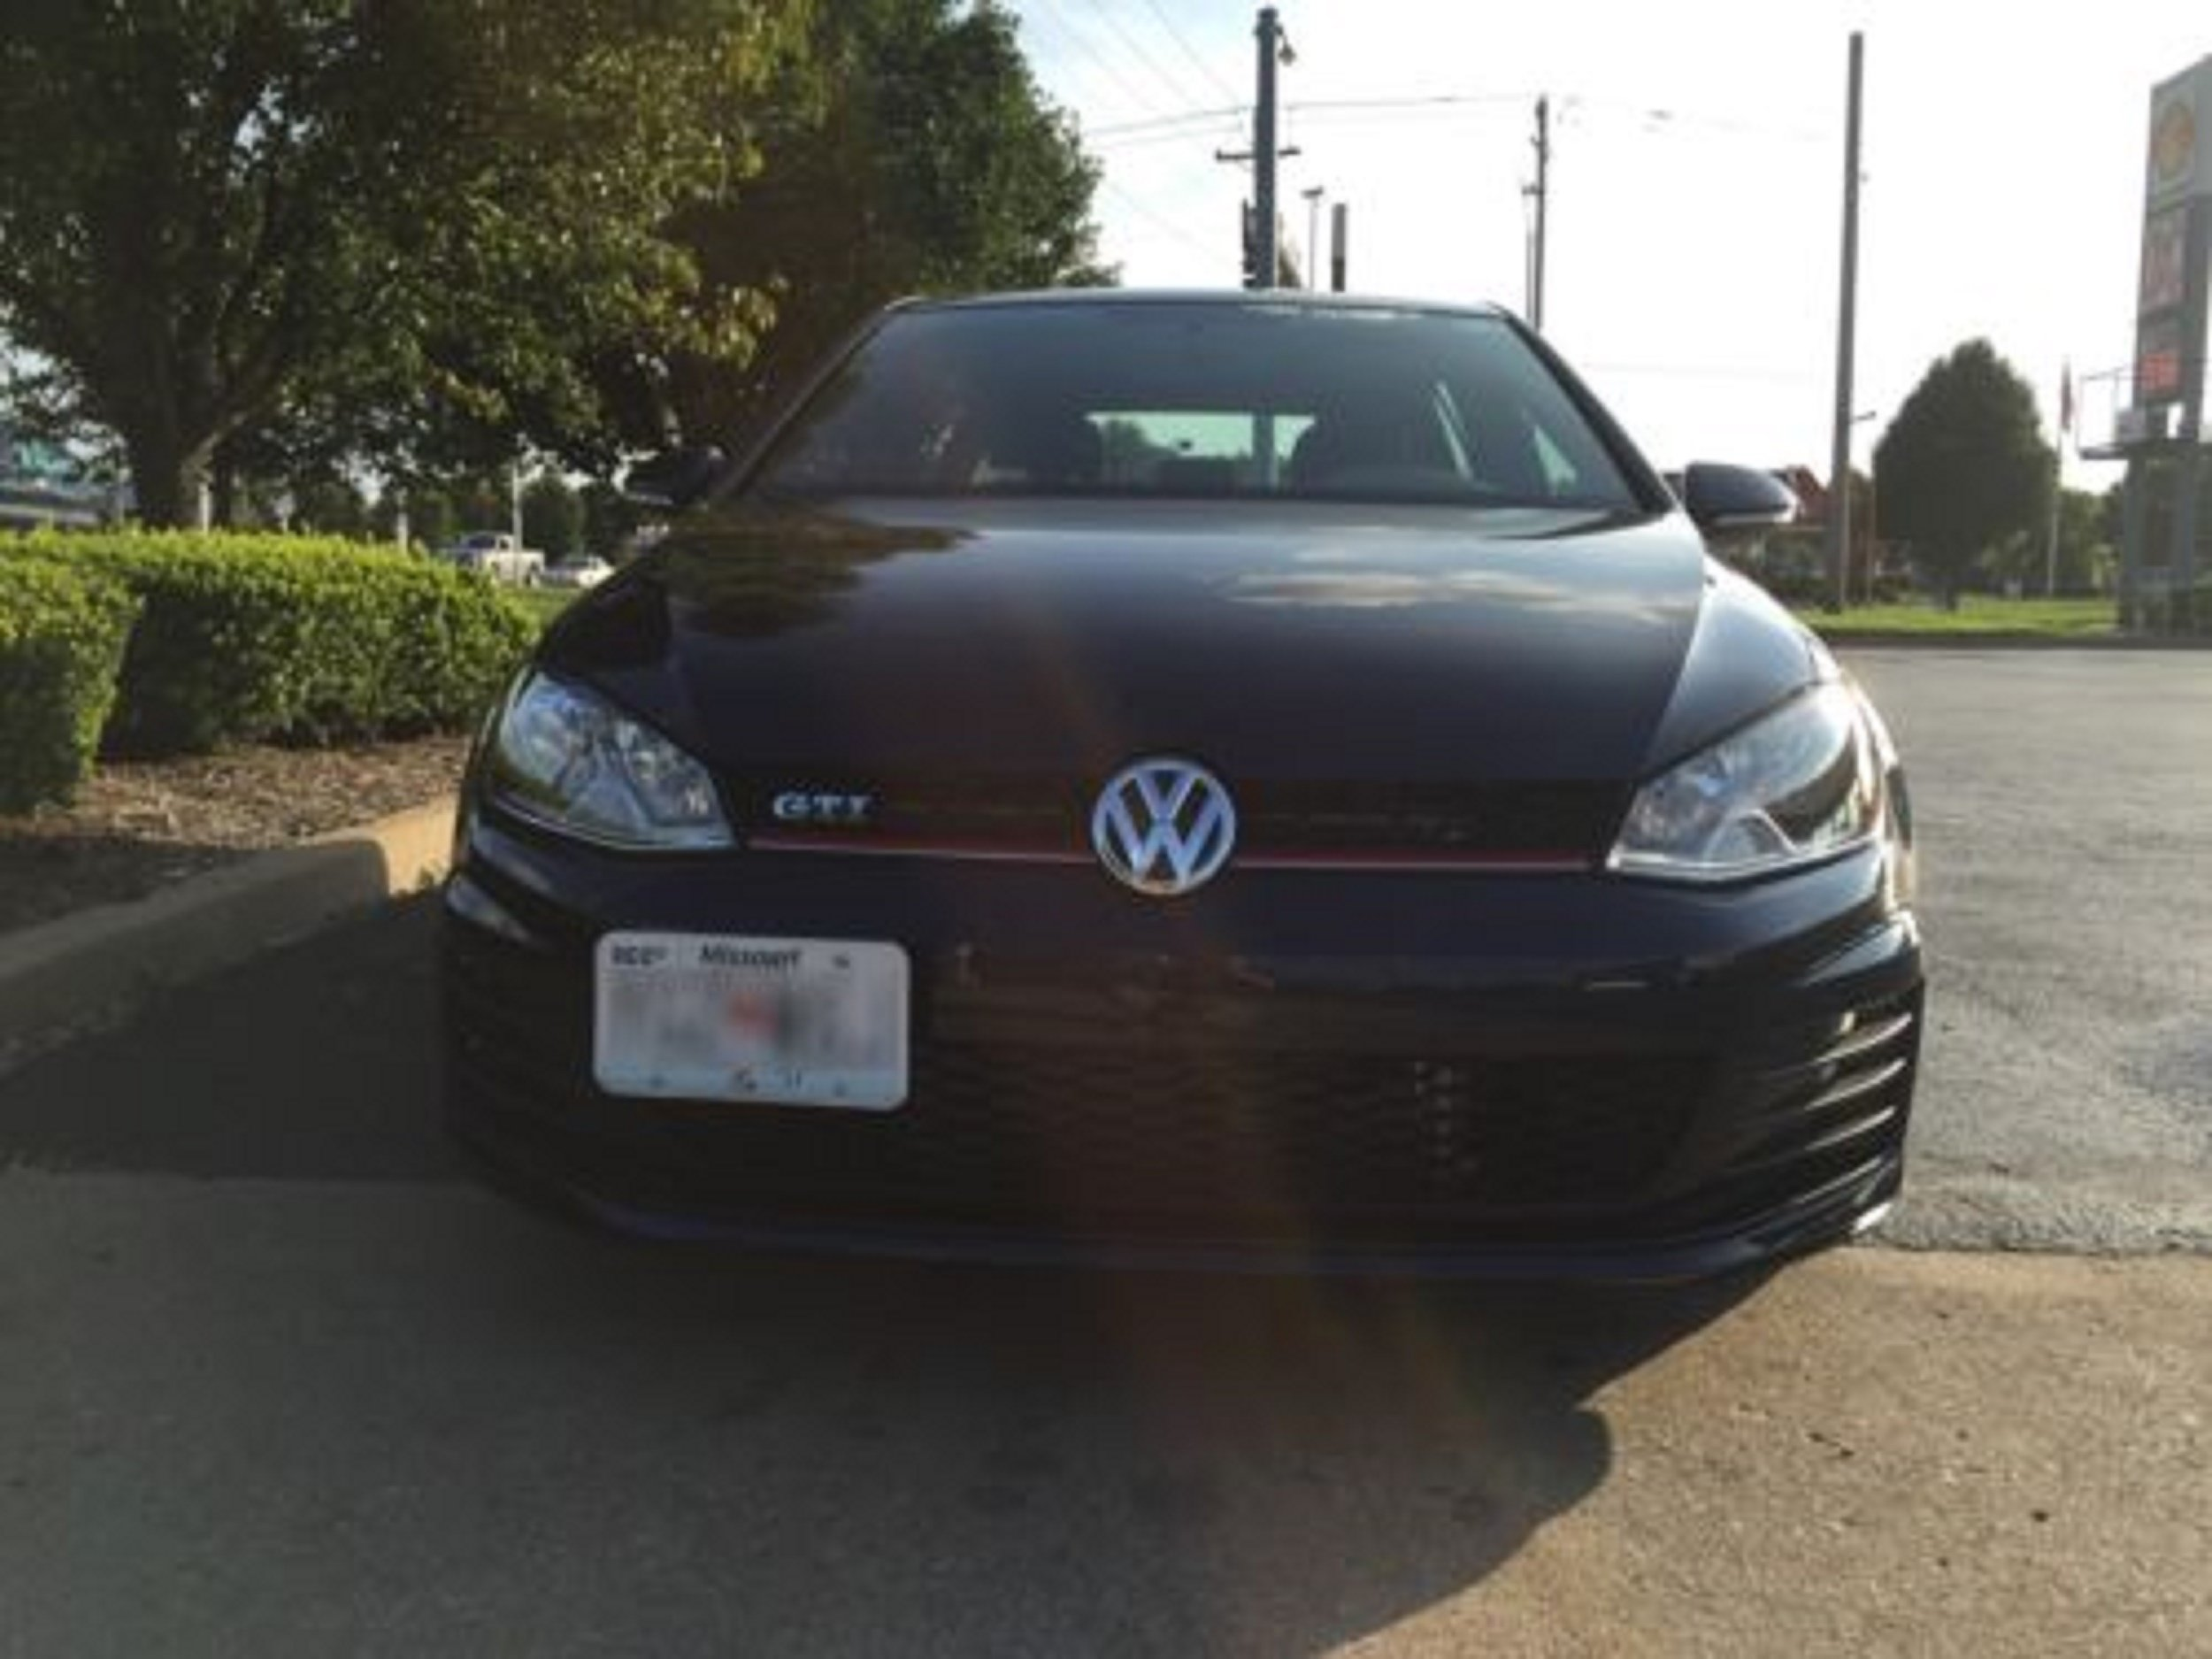 Bumper Tow Hook License Plate Mount Bracket For Volkswagen MK7 Golf GTi 2015 2016